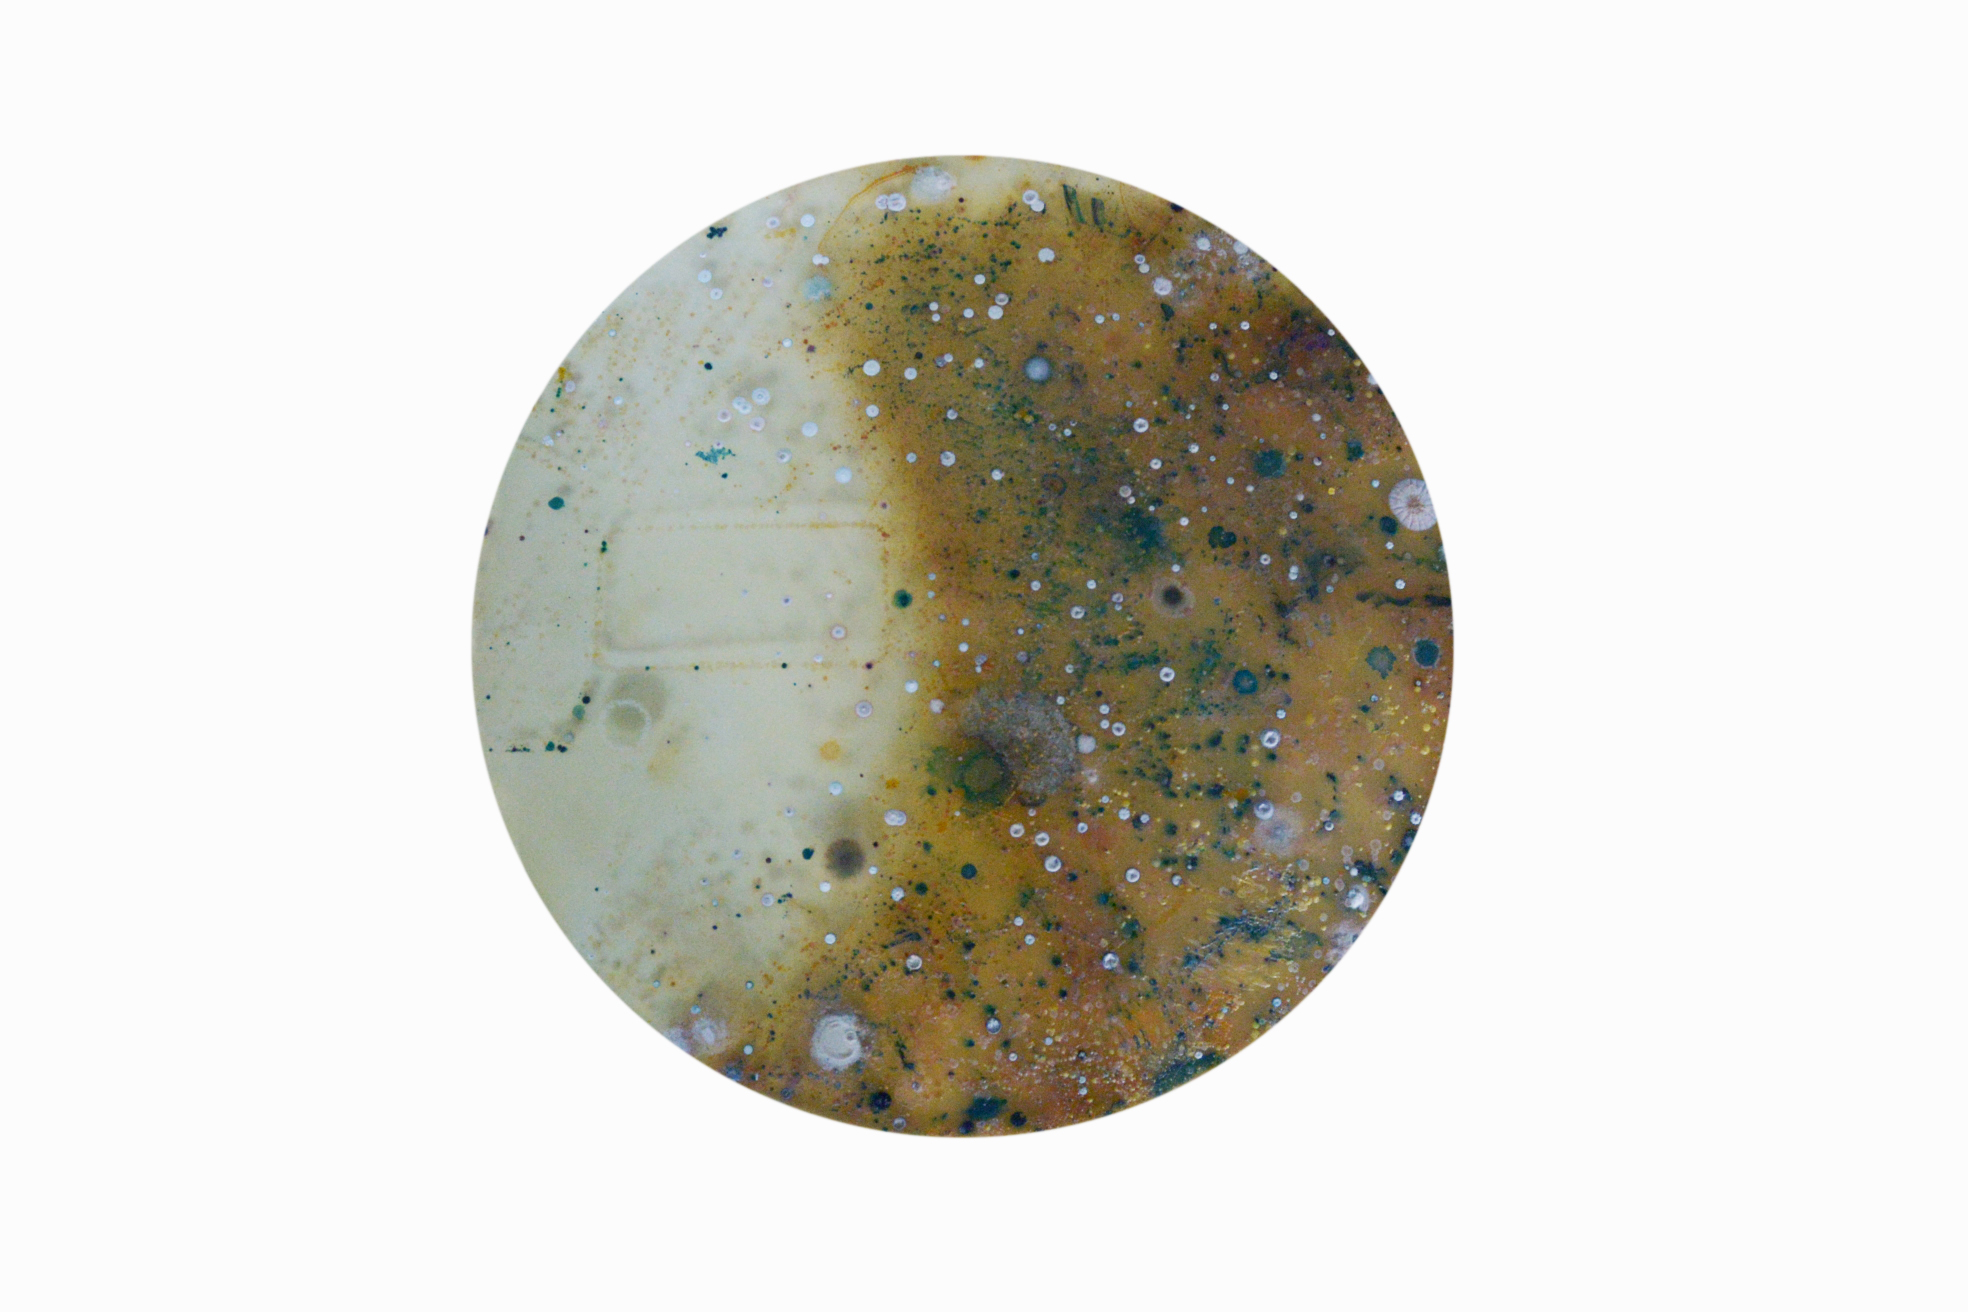 microbiome01.jpg